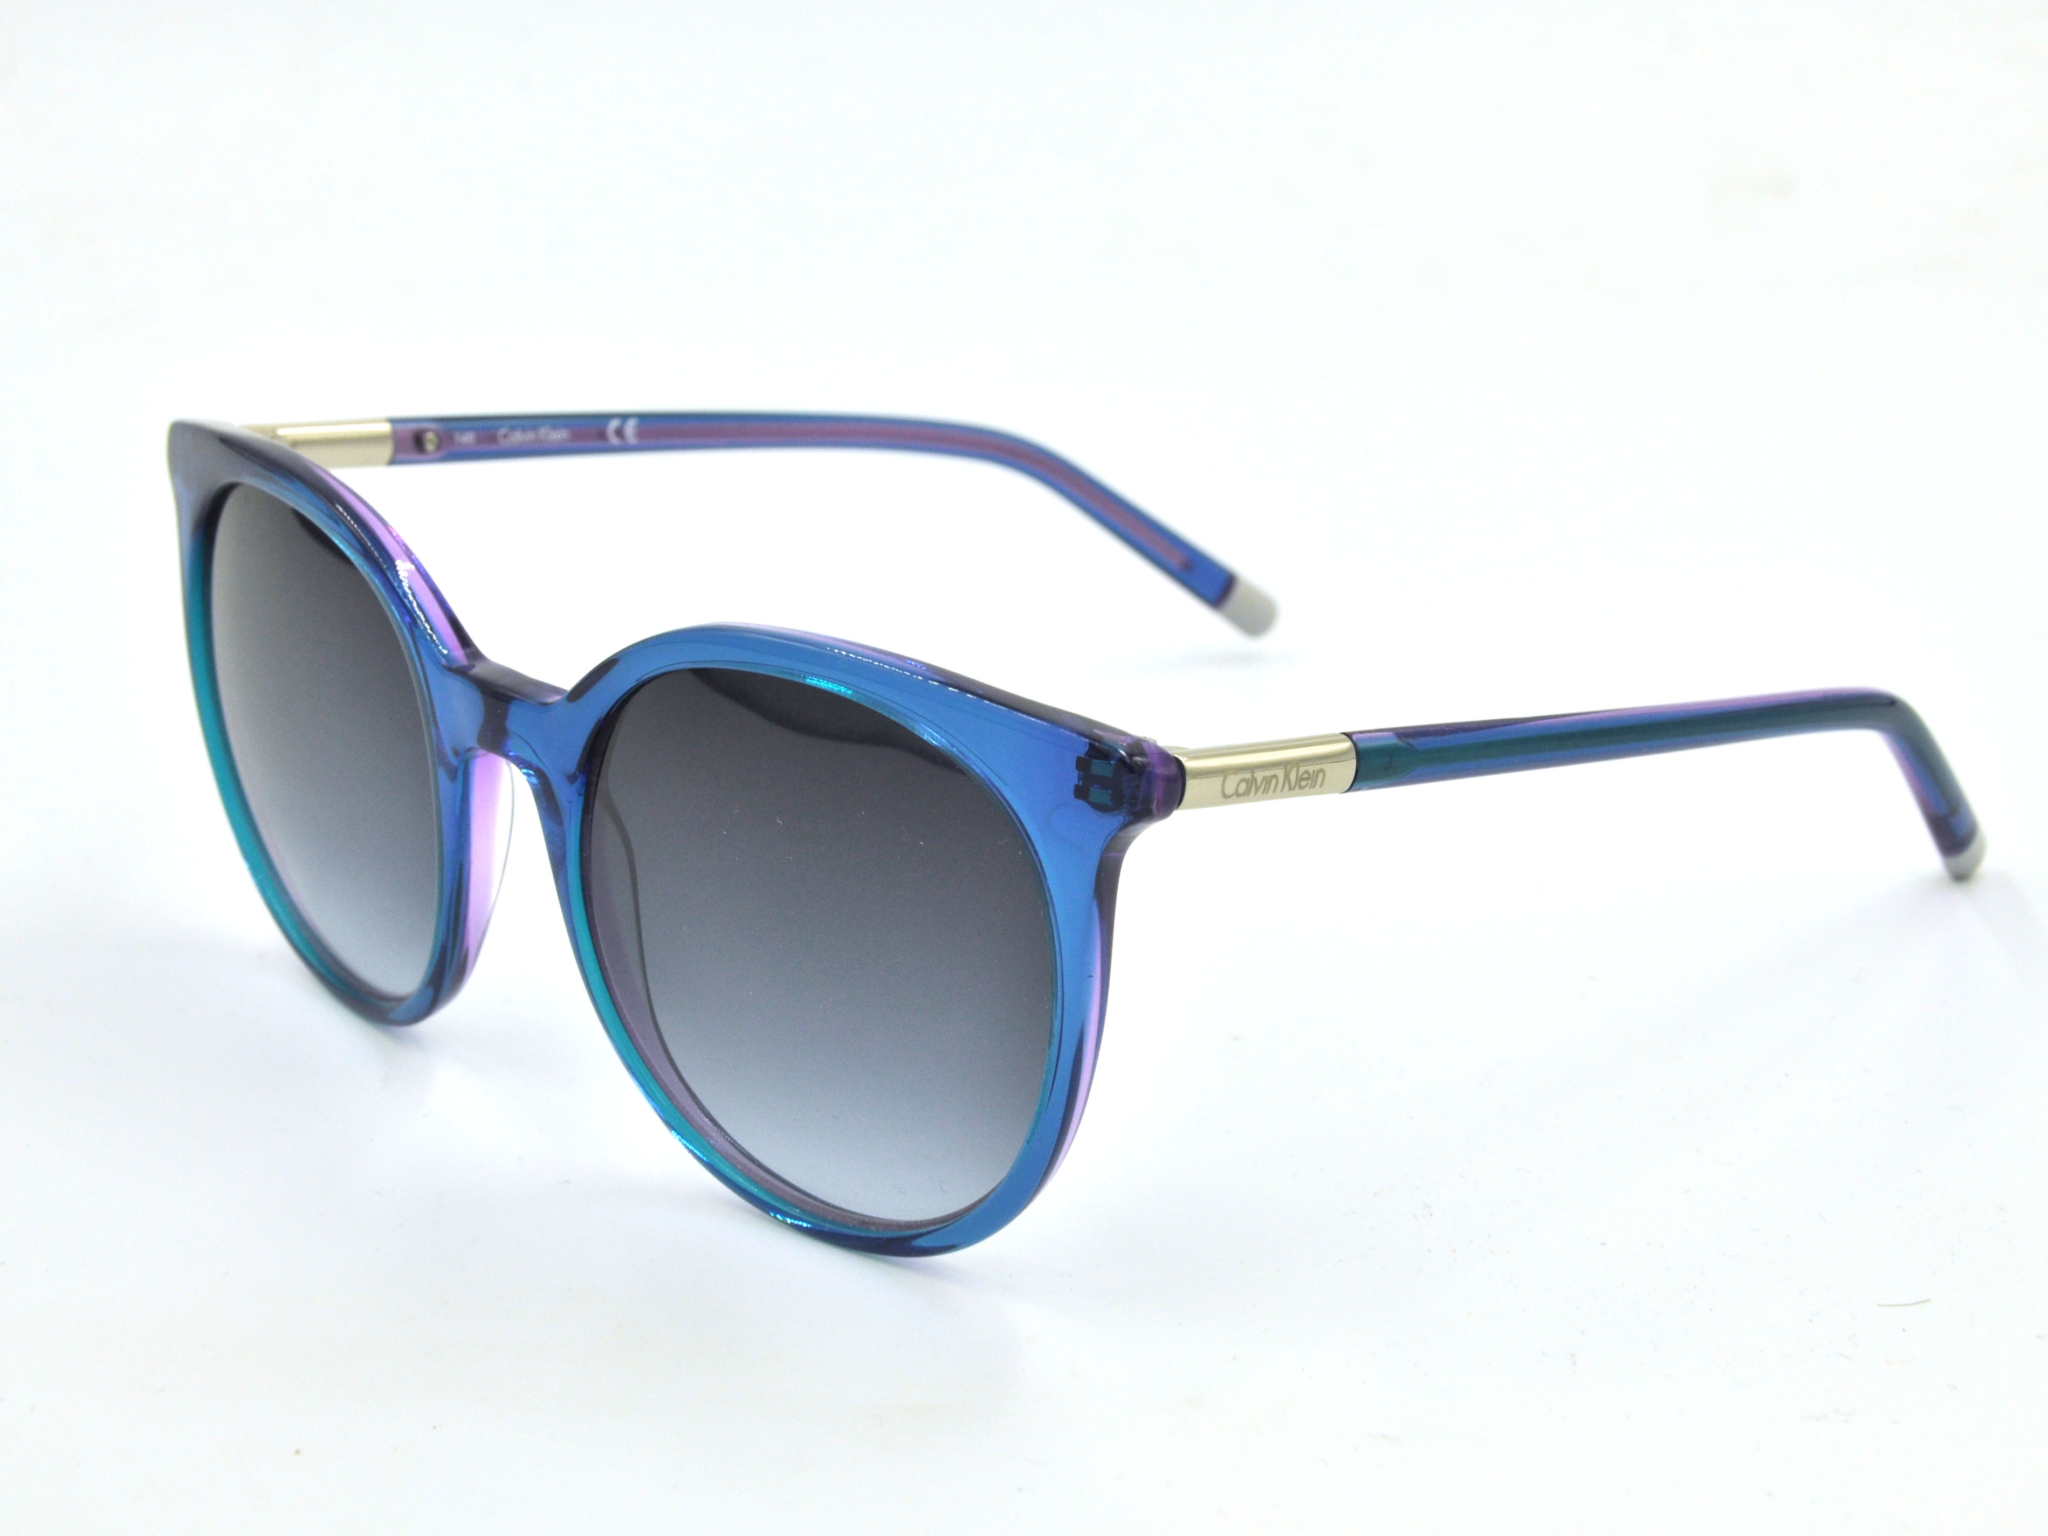 CALVIN KLEIN CK4355S 438 Sunglasses 2020